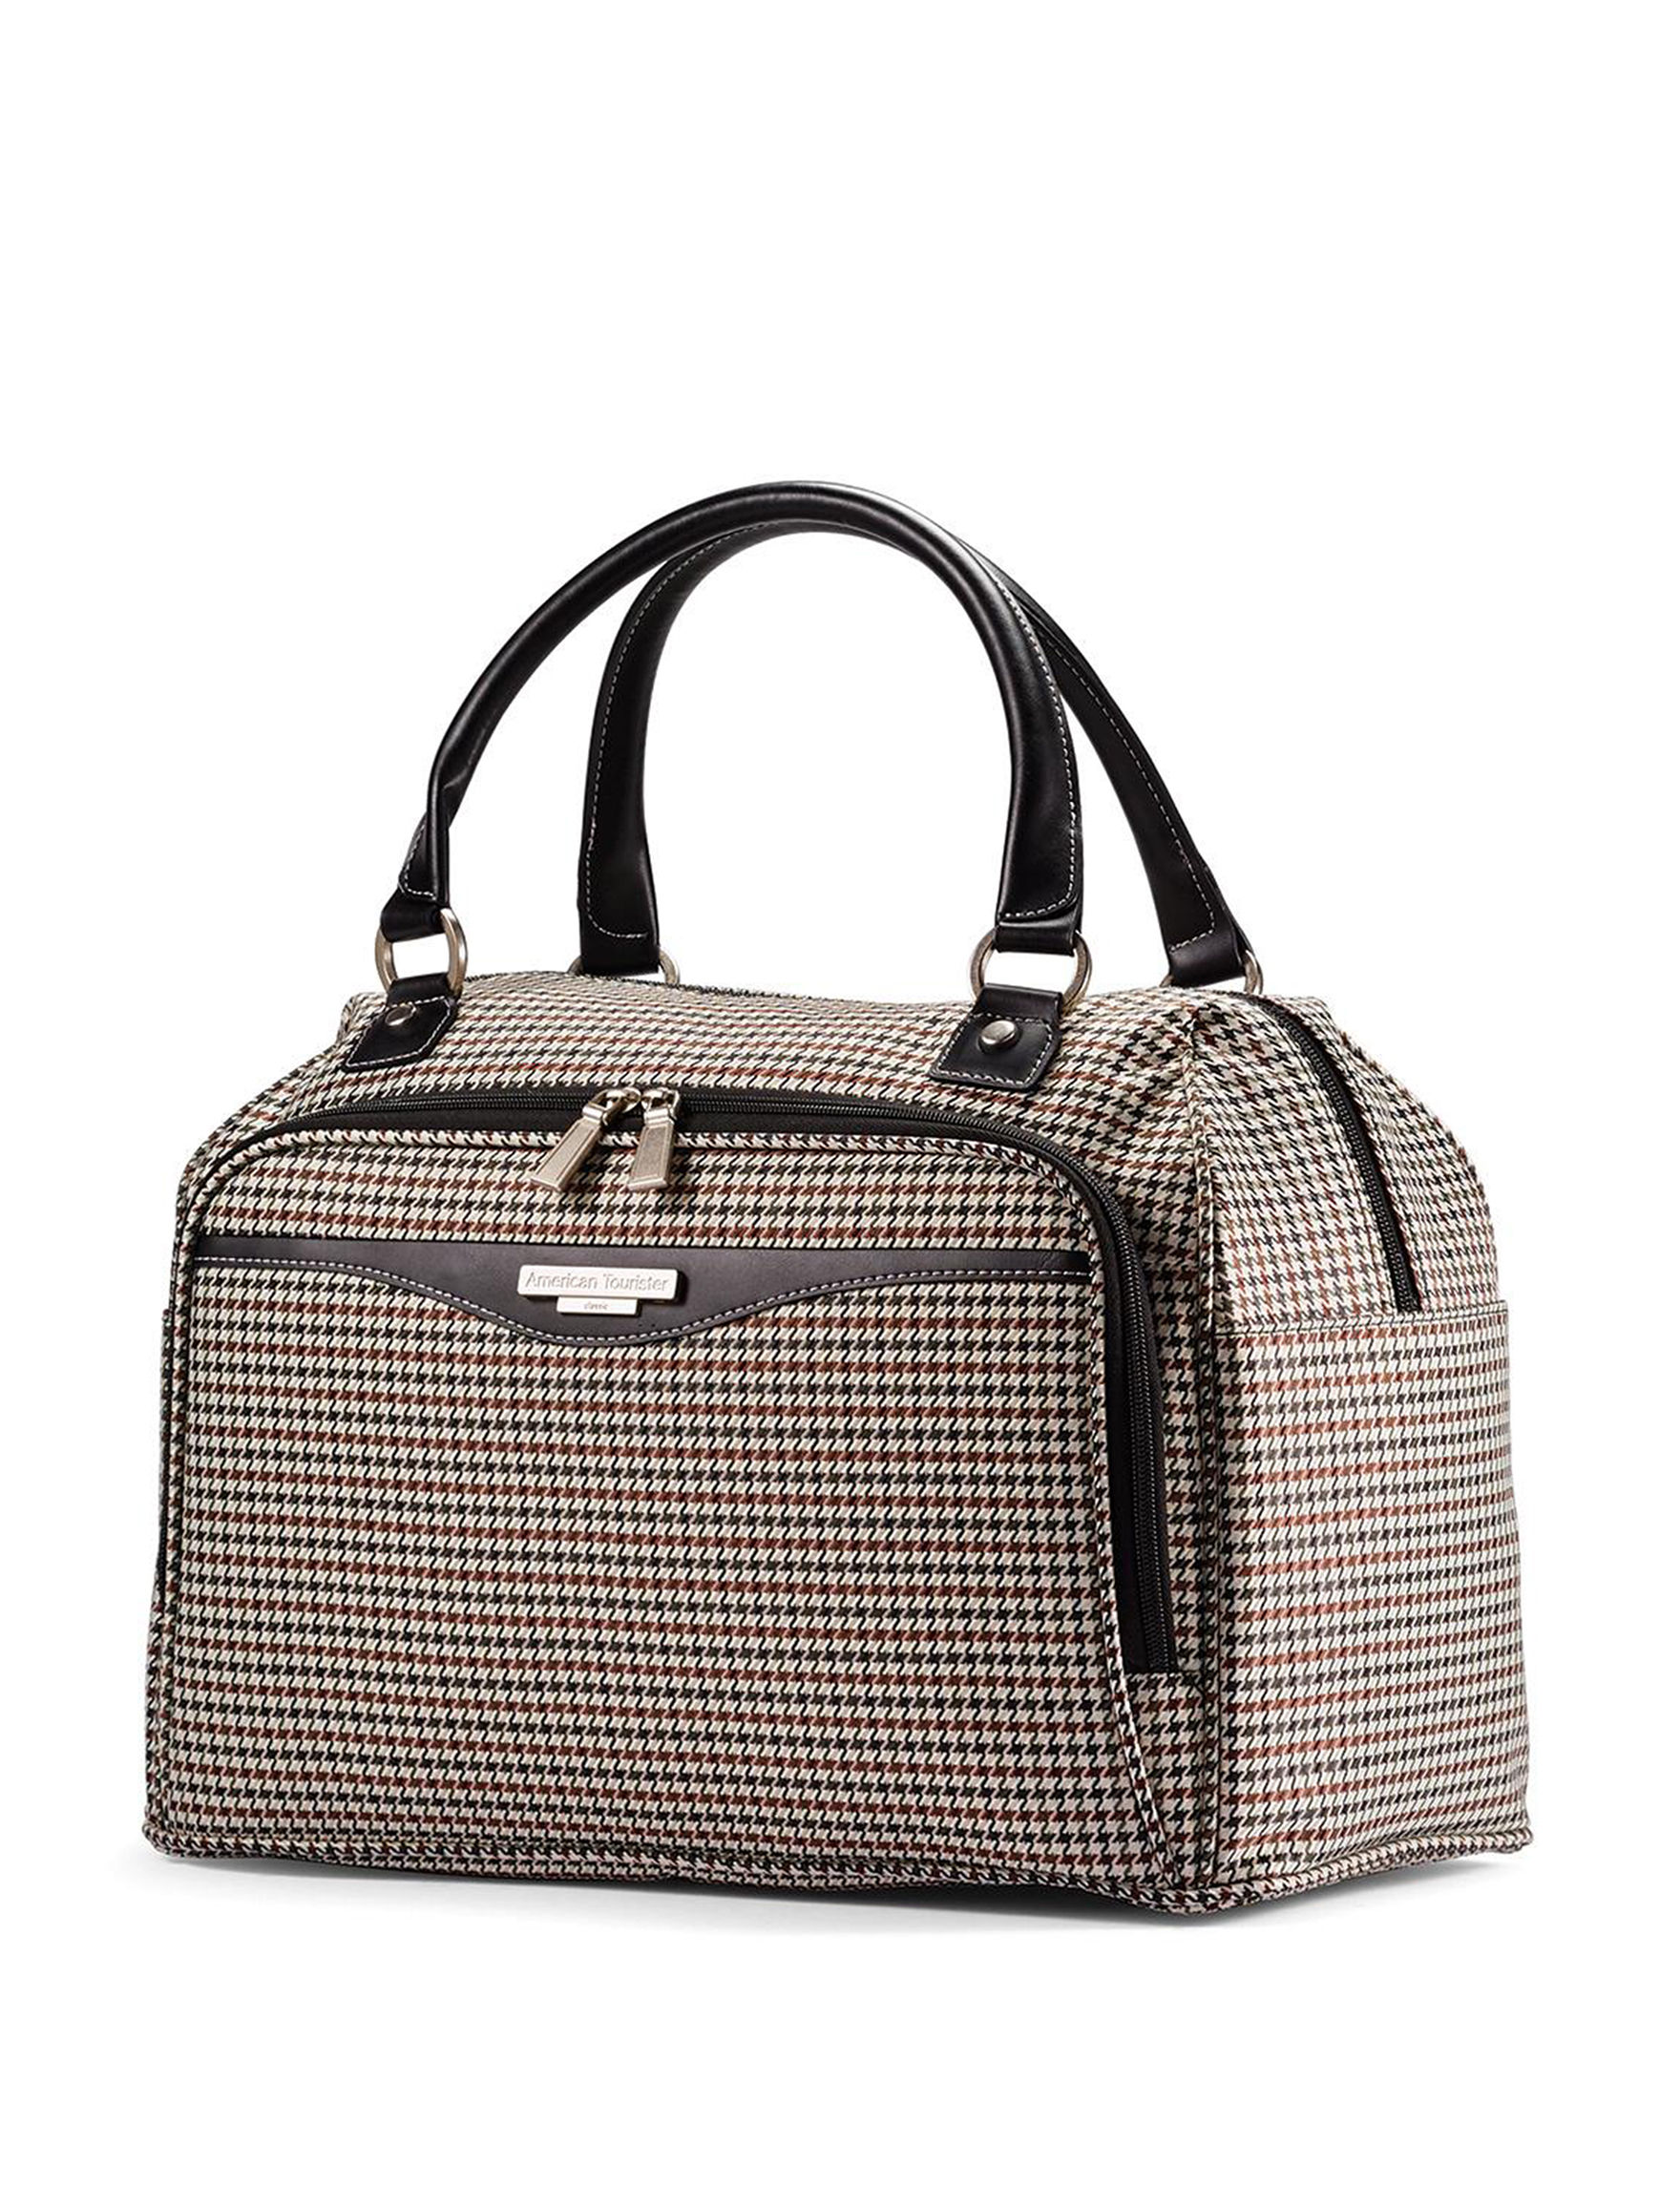 American Tourister Beige / Multi Duffle Bags